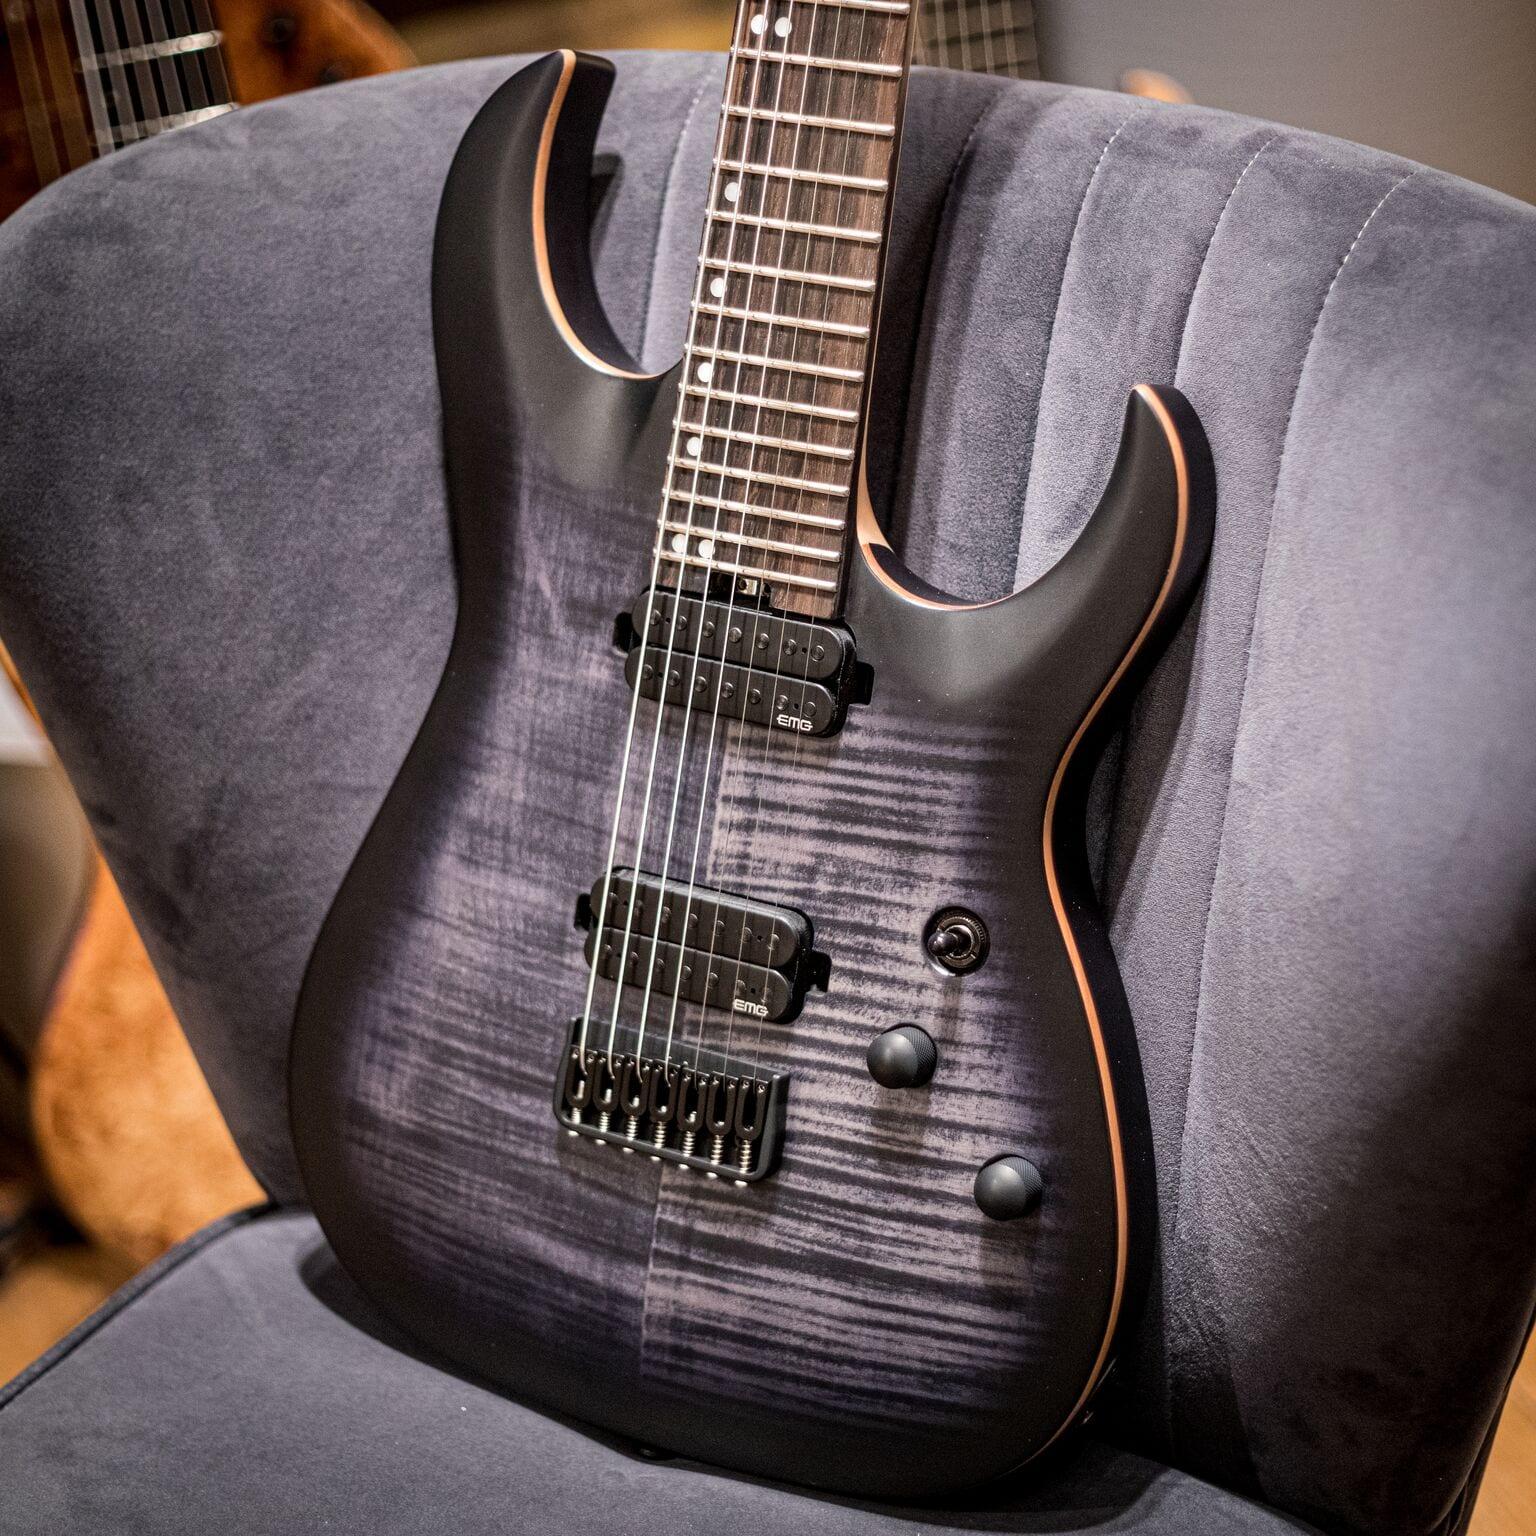 Harley Benton Amarok 7 String